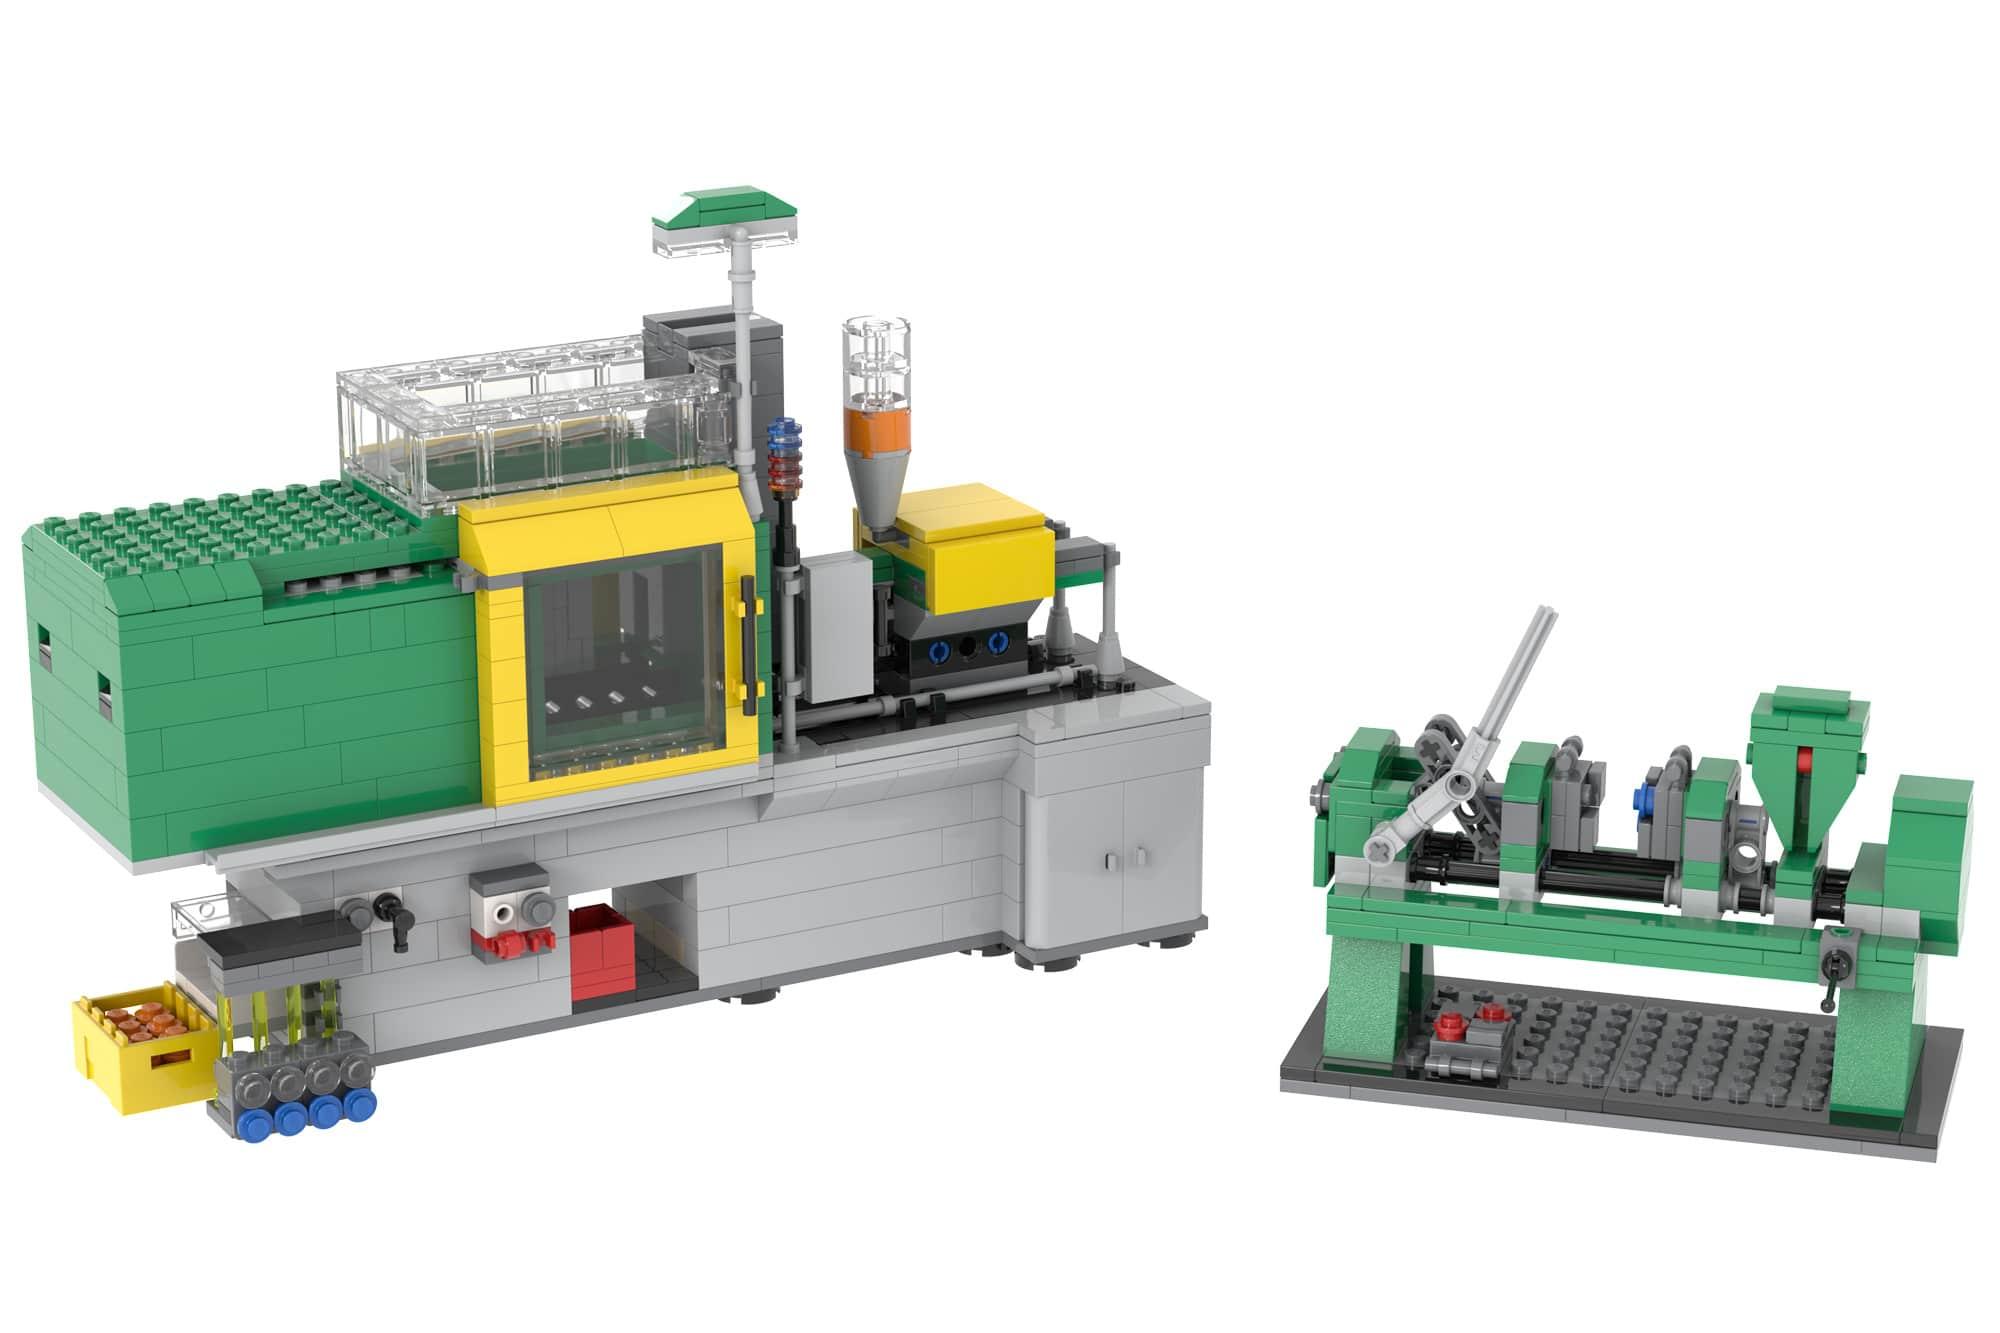 LEGO 4000001 Moulding Machines Render 1